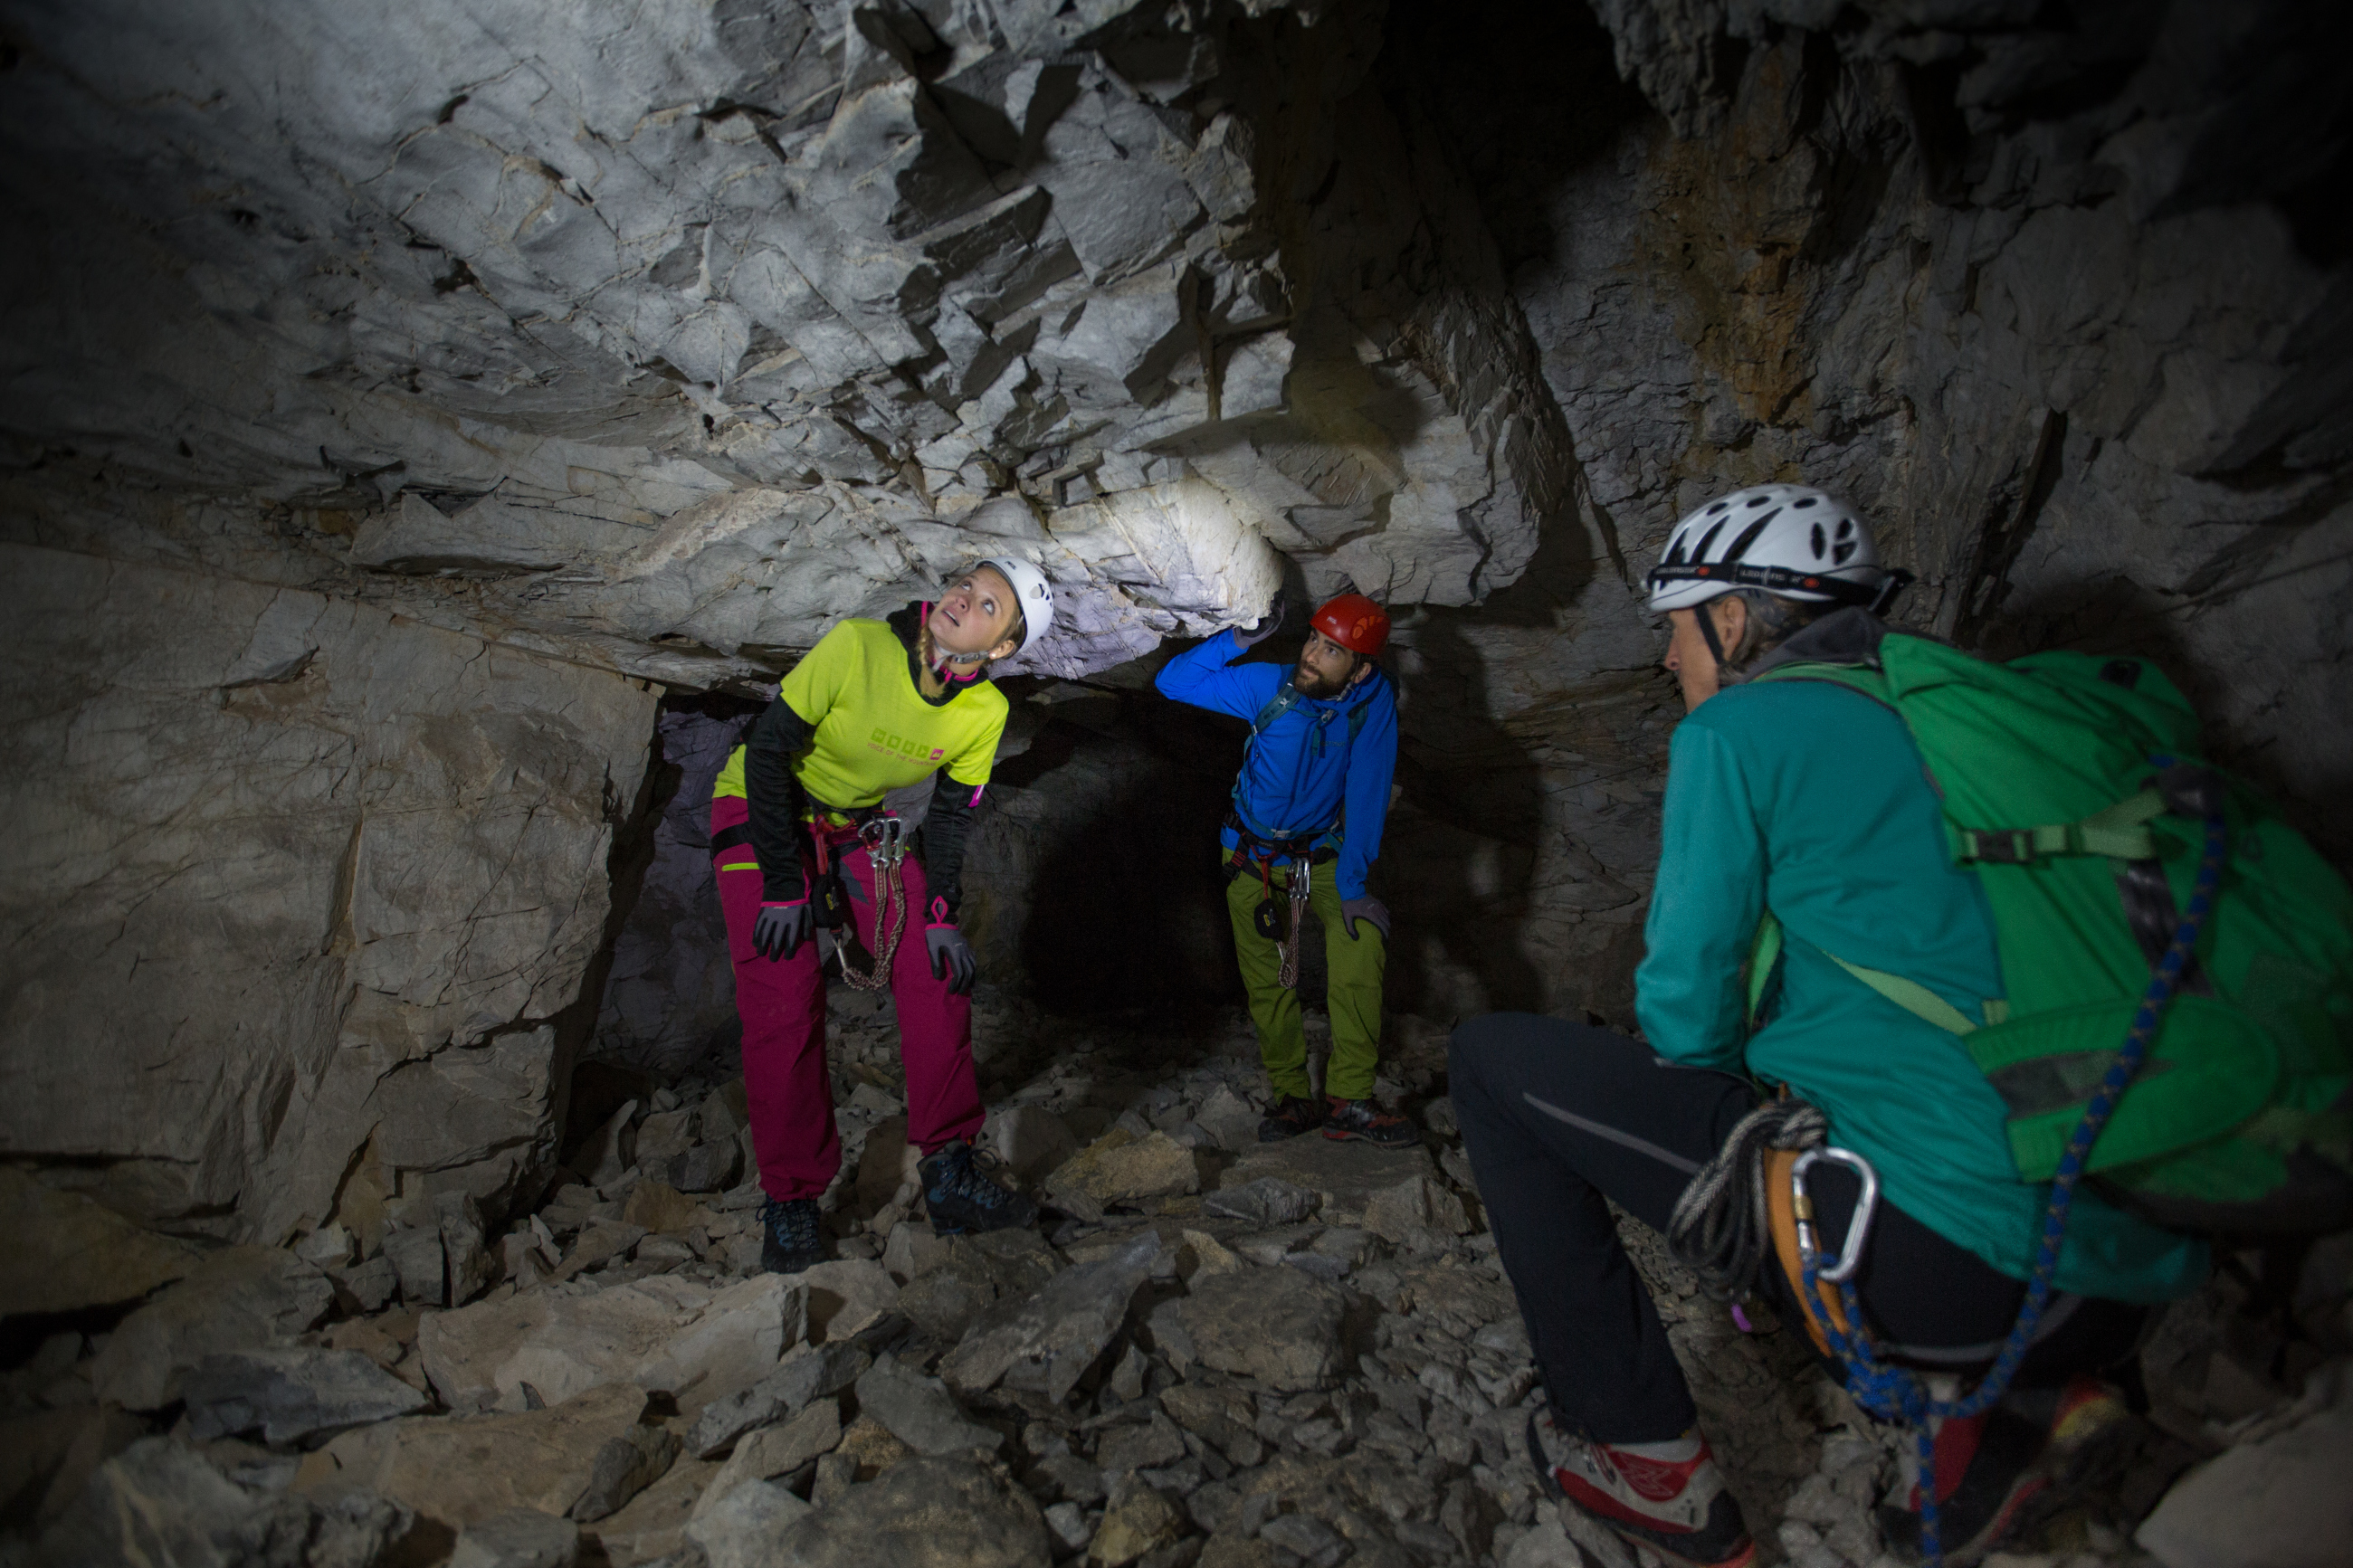 Klettergurt Klettersteig : Klettersteig gauablickhöhle montafon.at